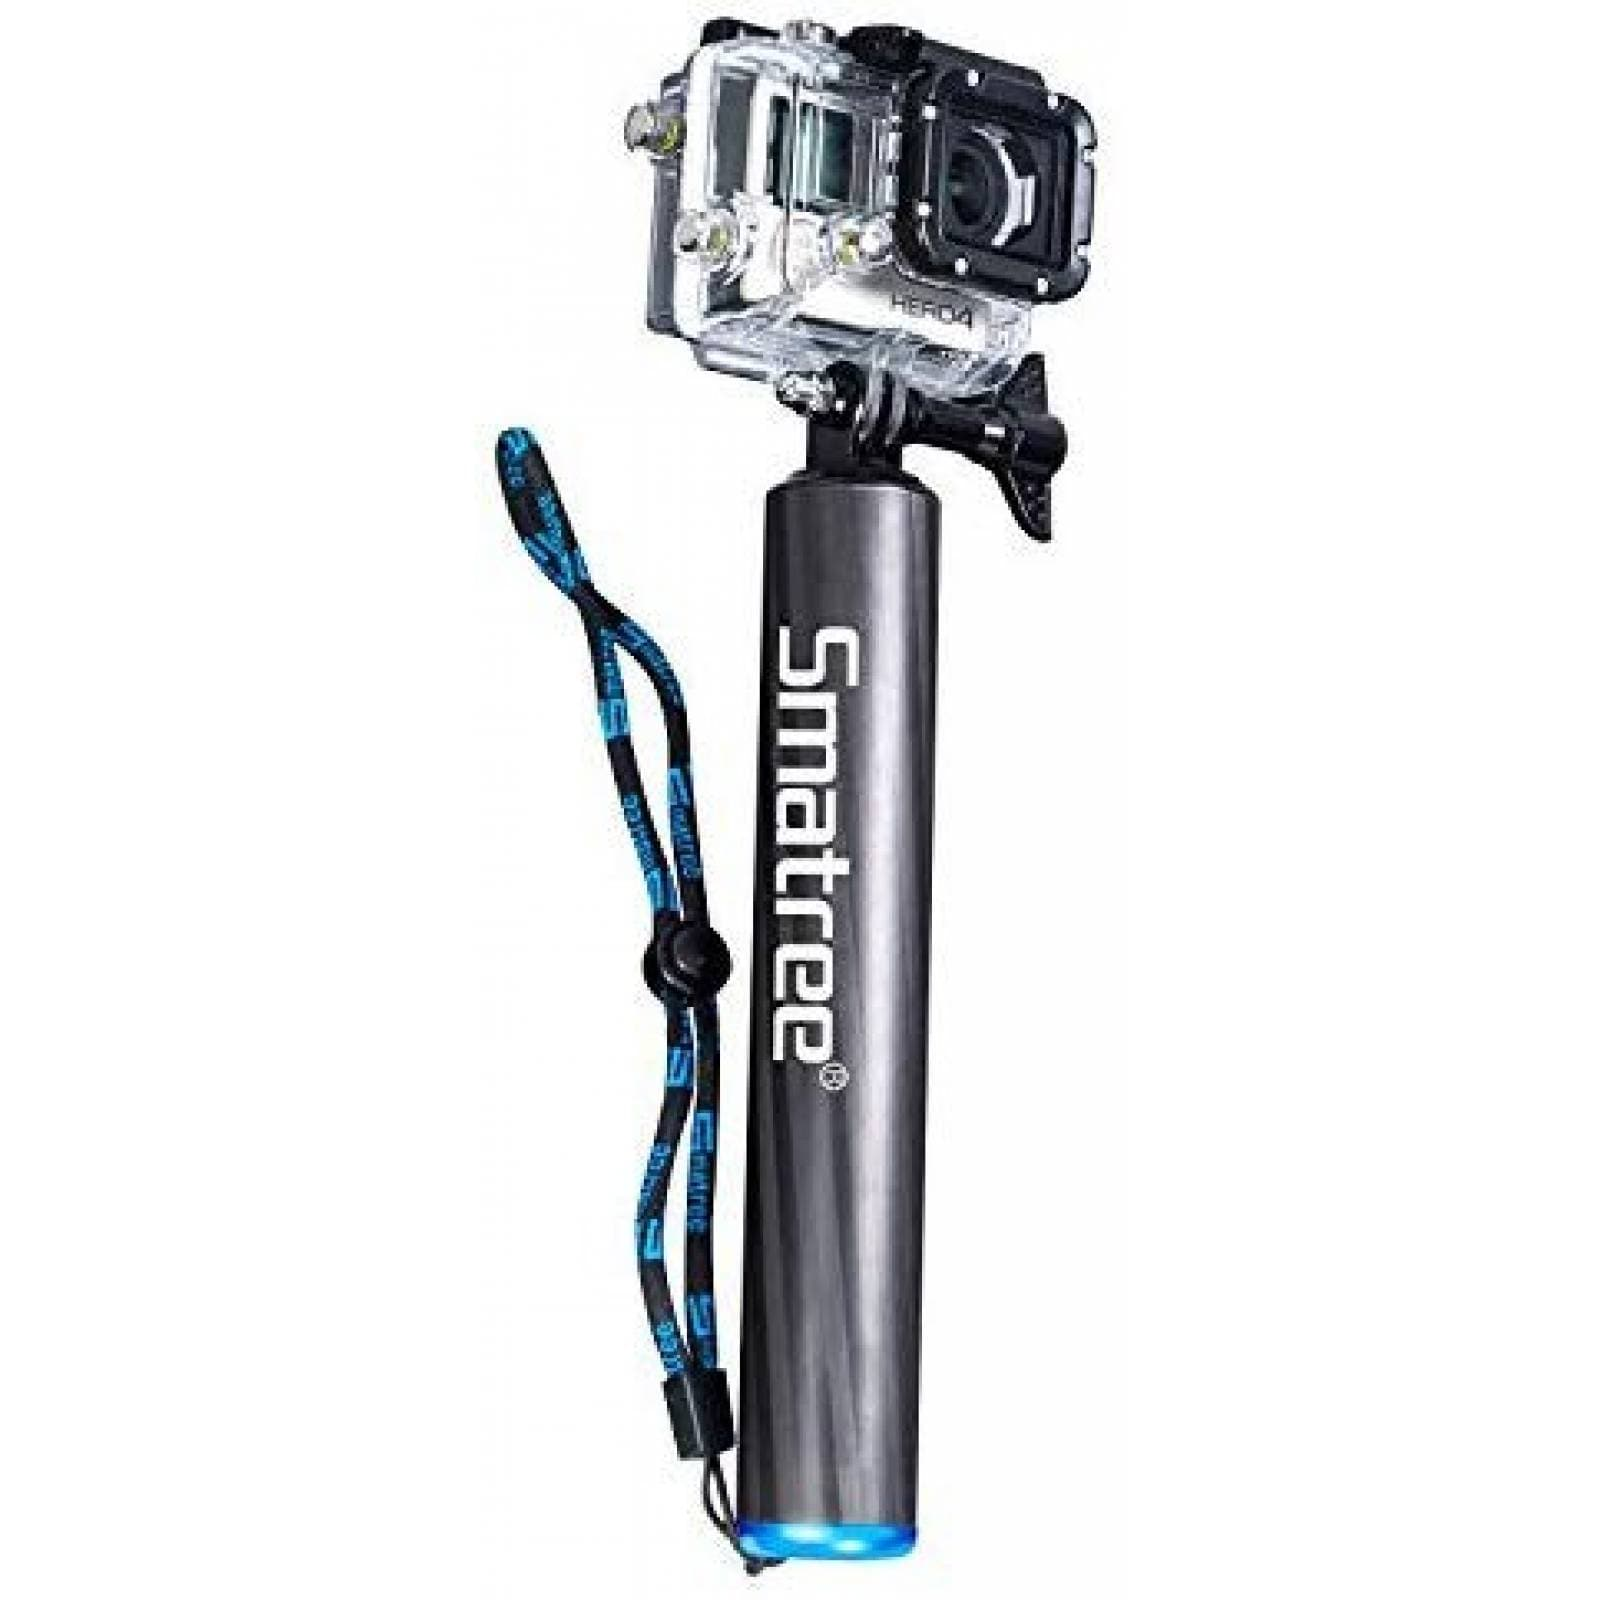 Selfiestick Smatree F2 flotante fibra de carbono -Negro